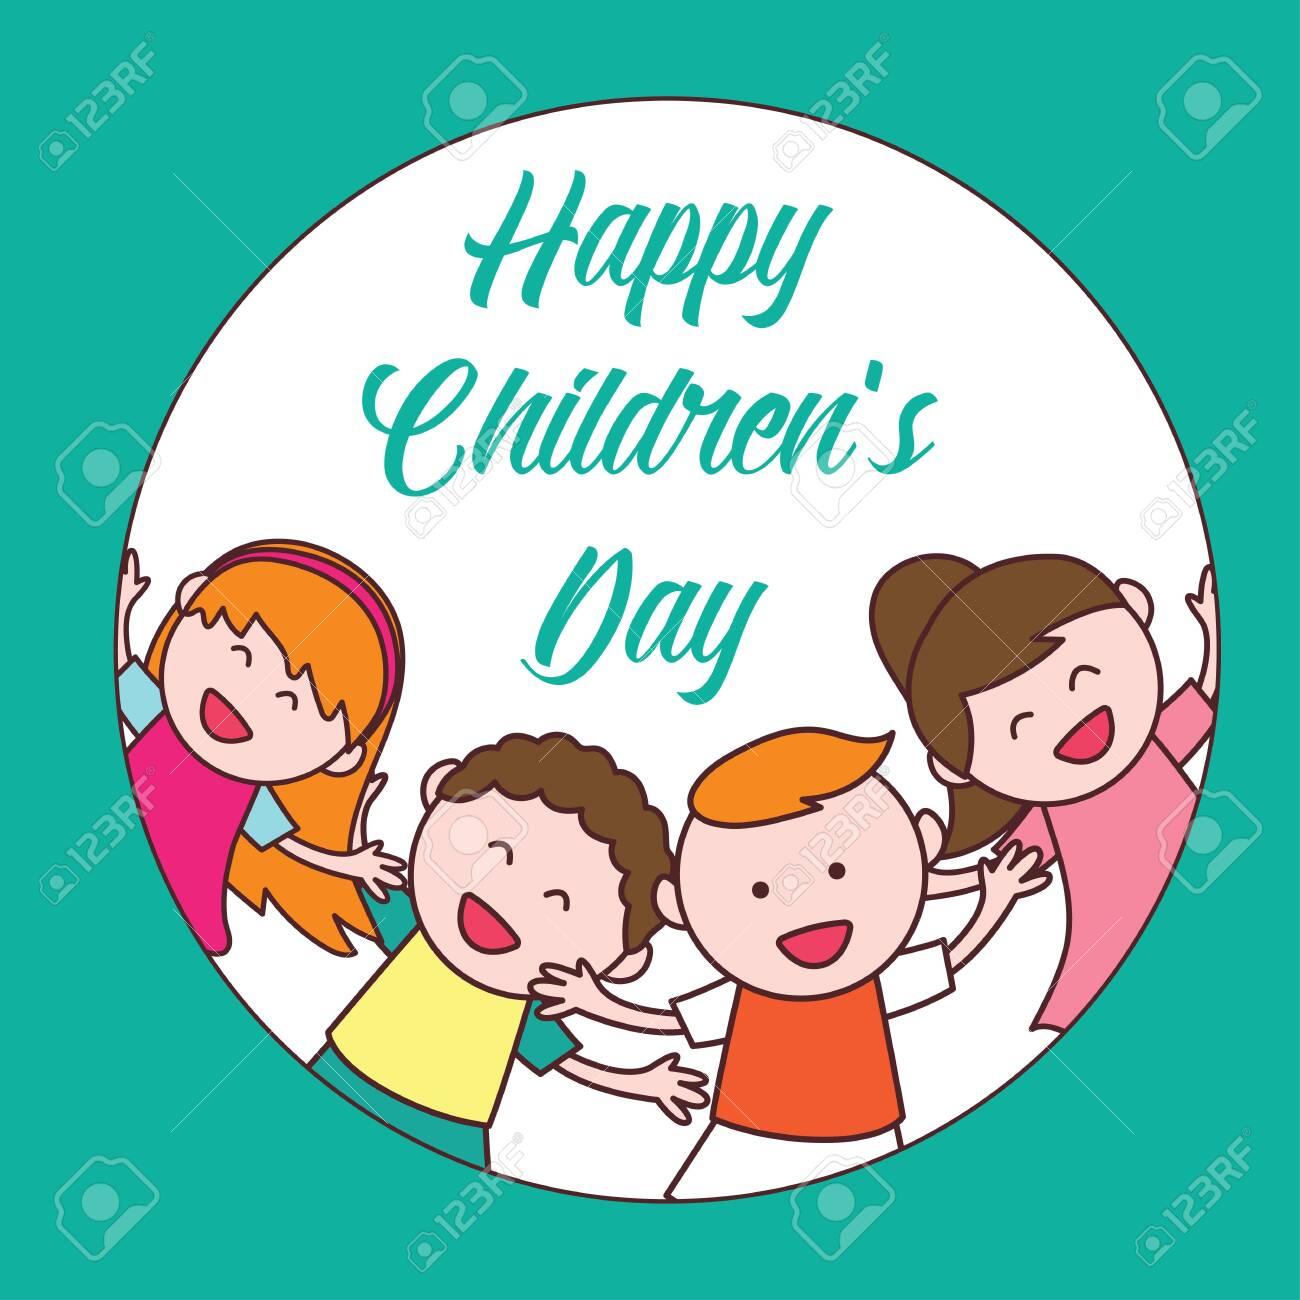 Happy children day logo illustration   Stock vector   Colourbox